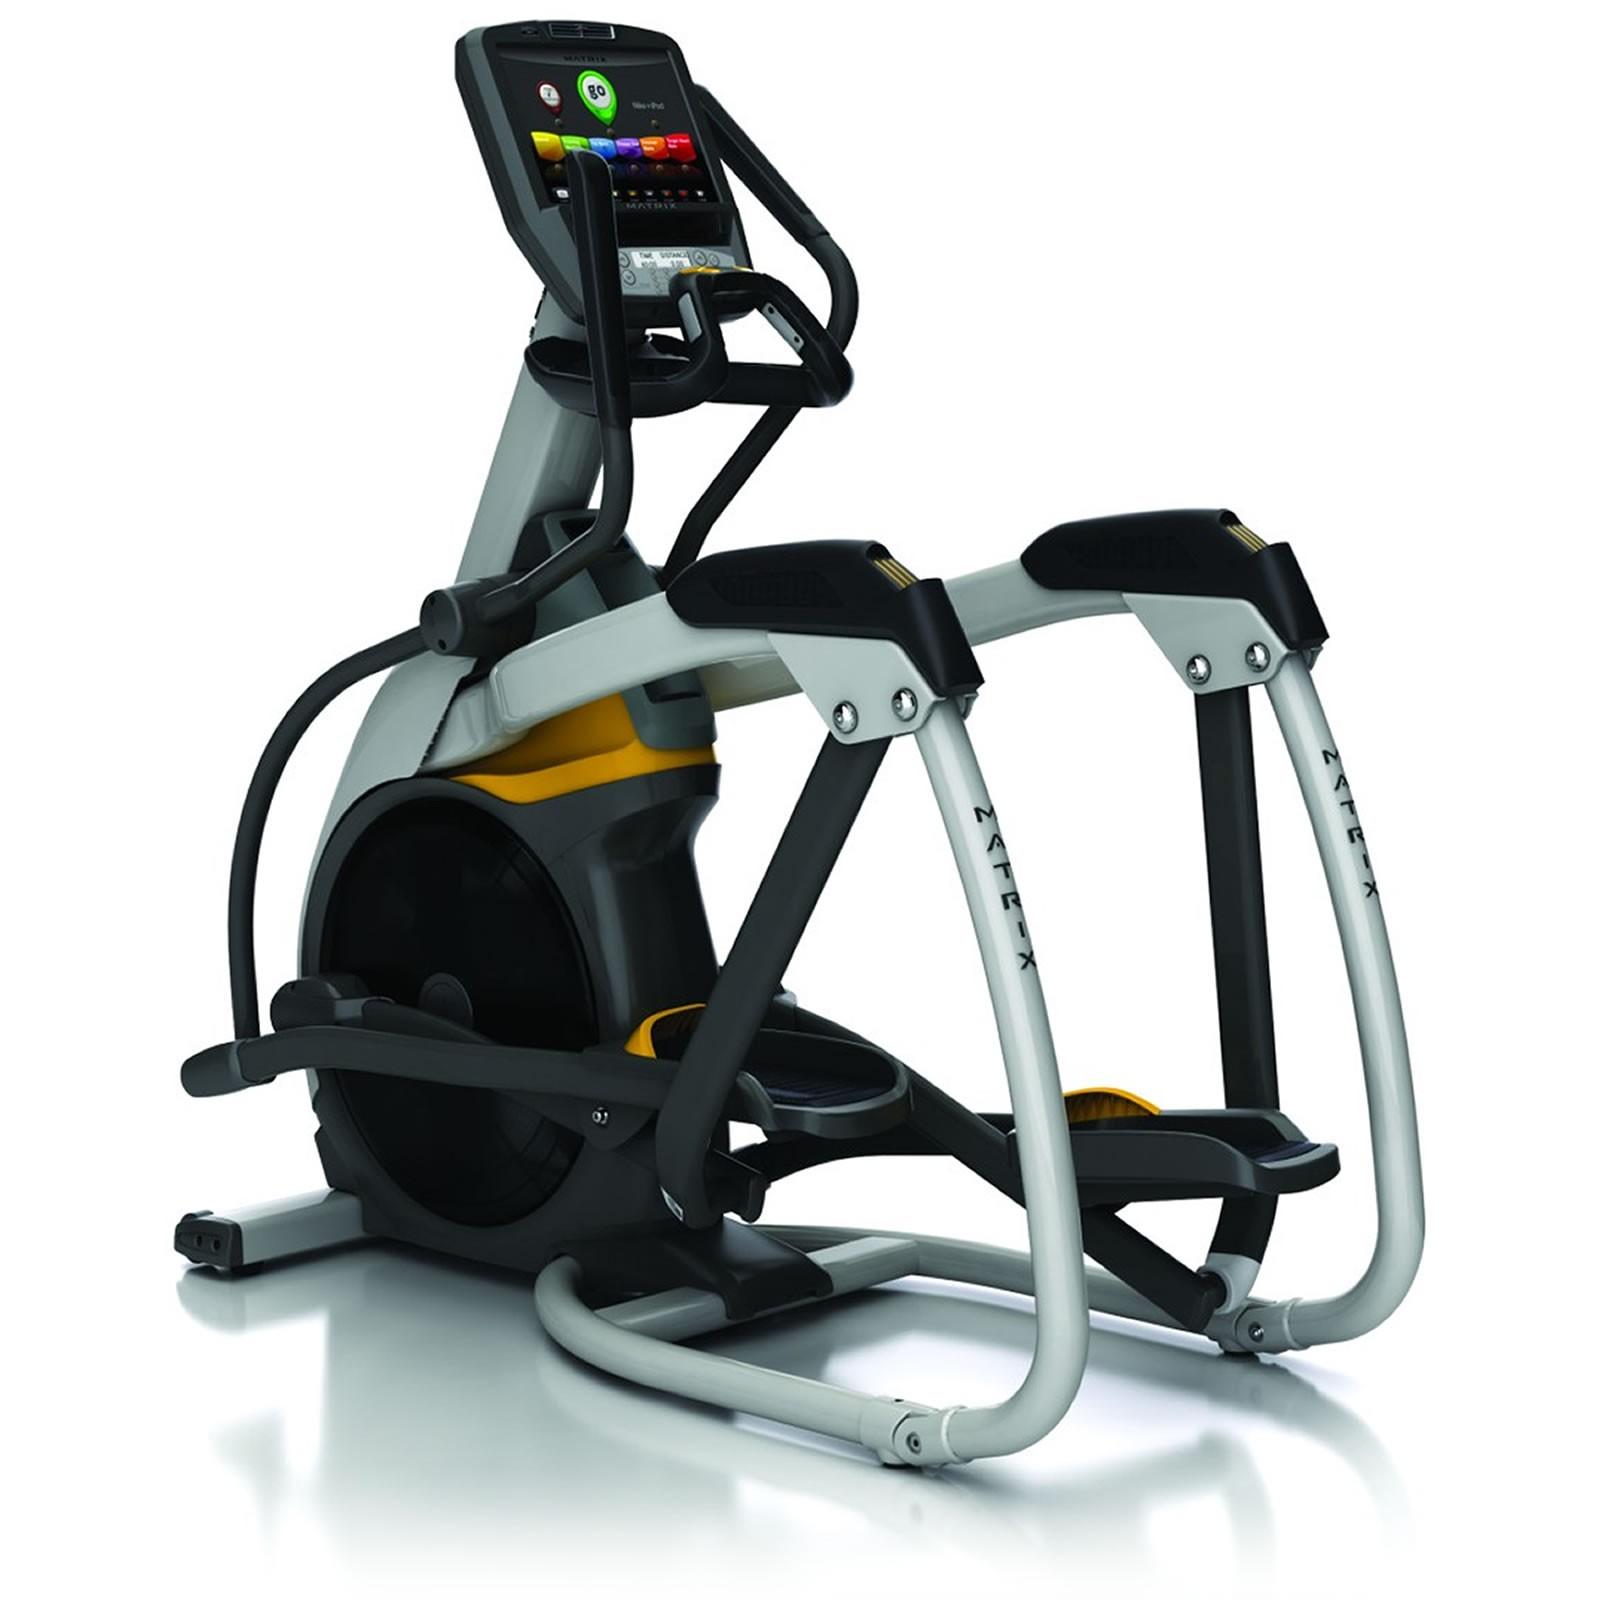 Used Elliptical For Sale >> Matrix A7xe Suspension Ascent Trainer -Remanufactured ...